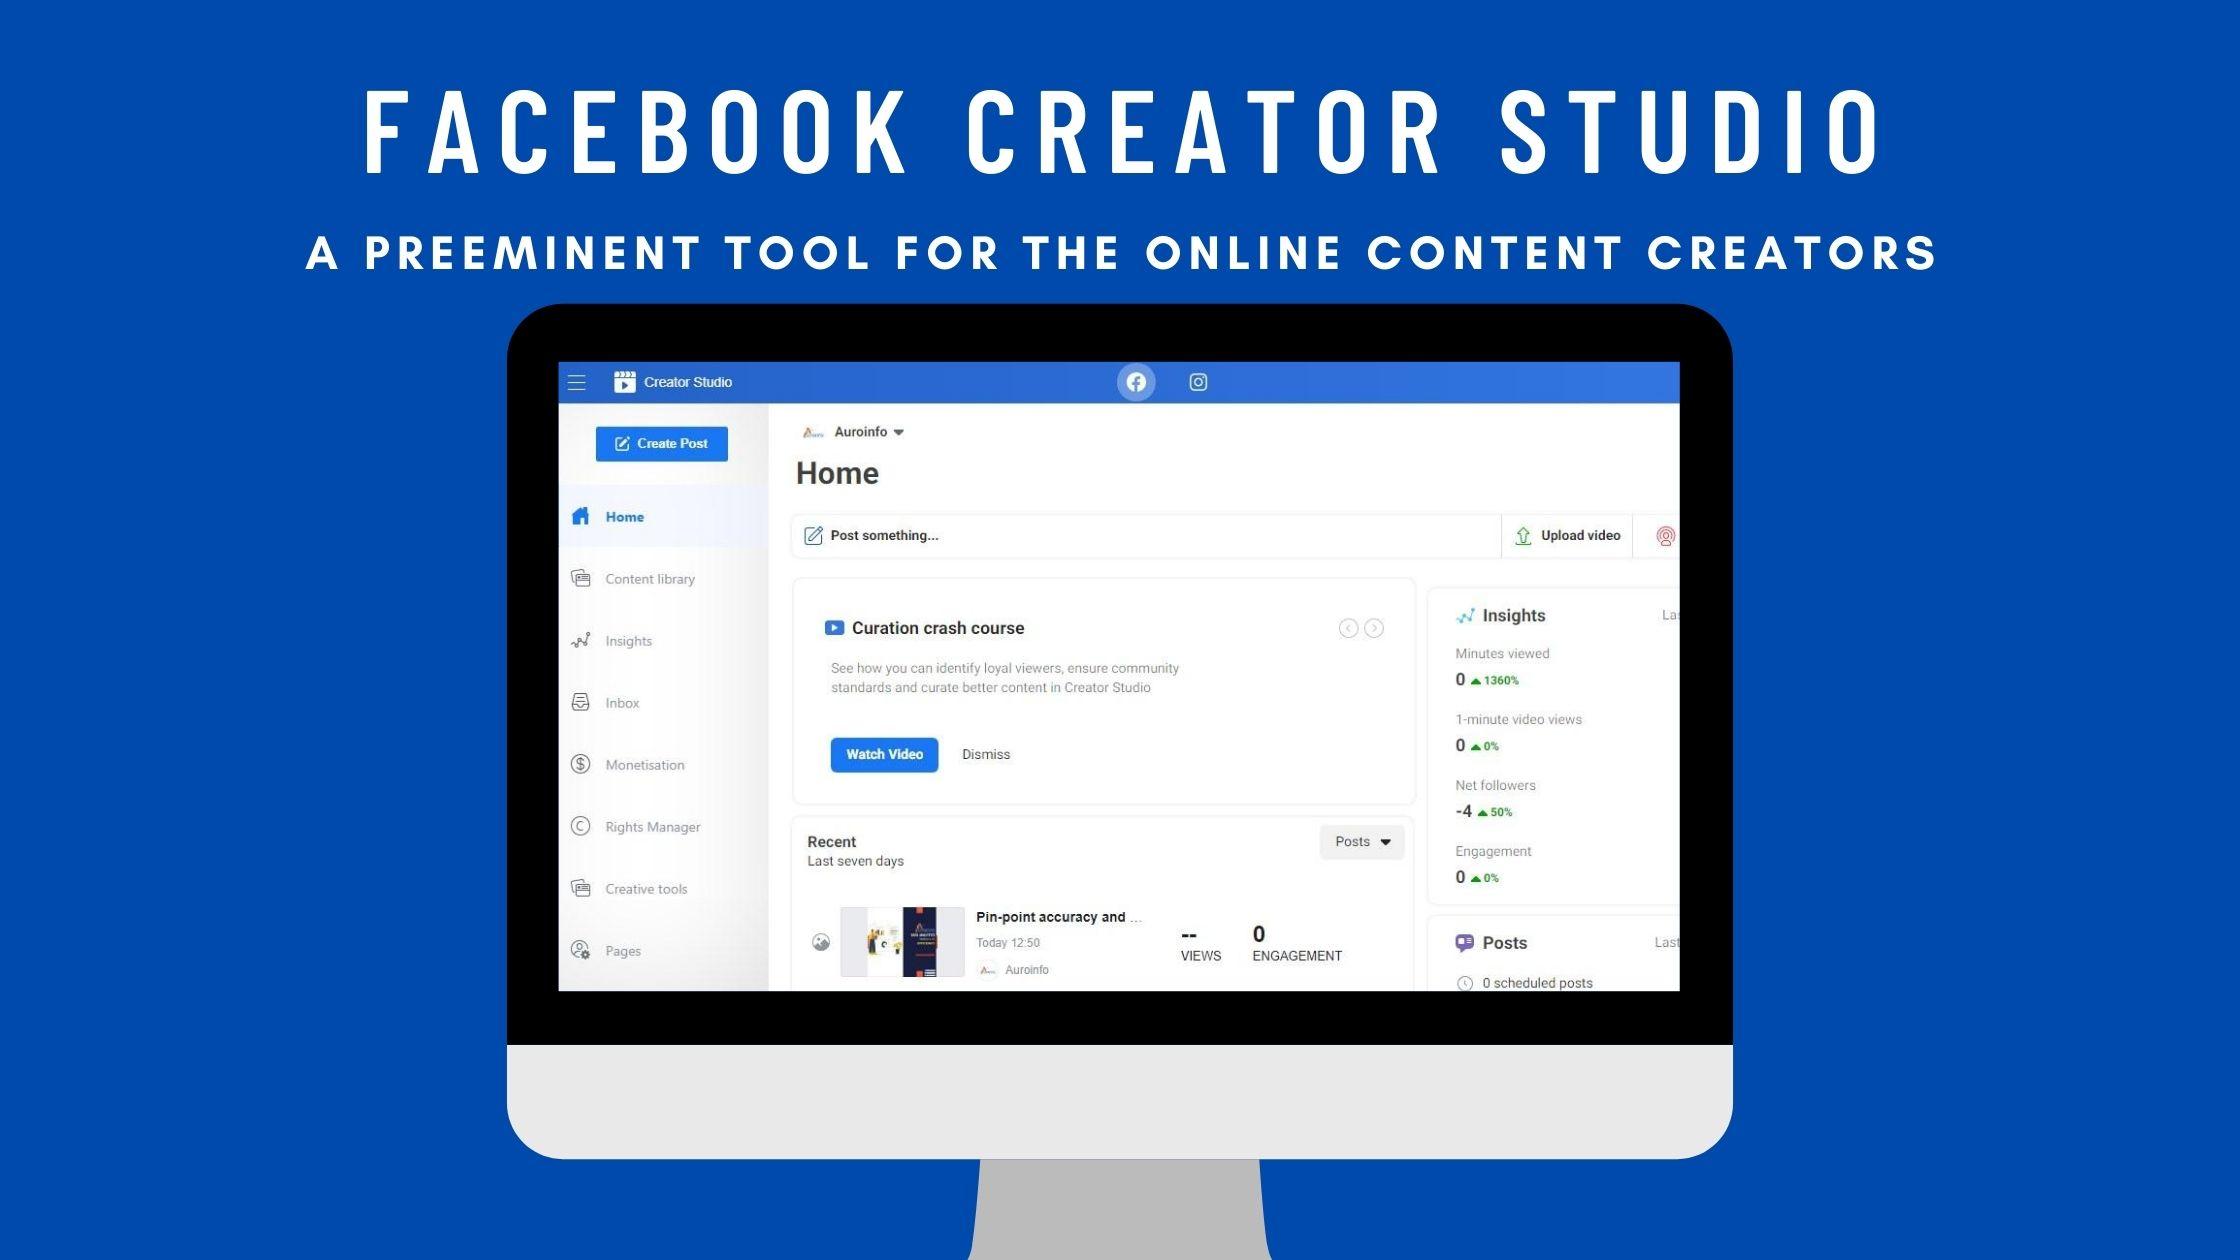 Facebook Creator Studio- A Preeminent Tool For the Online Content Creators